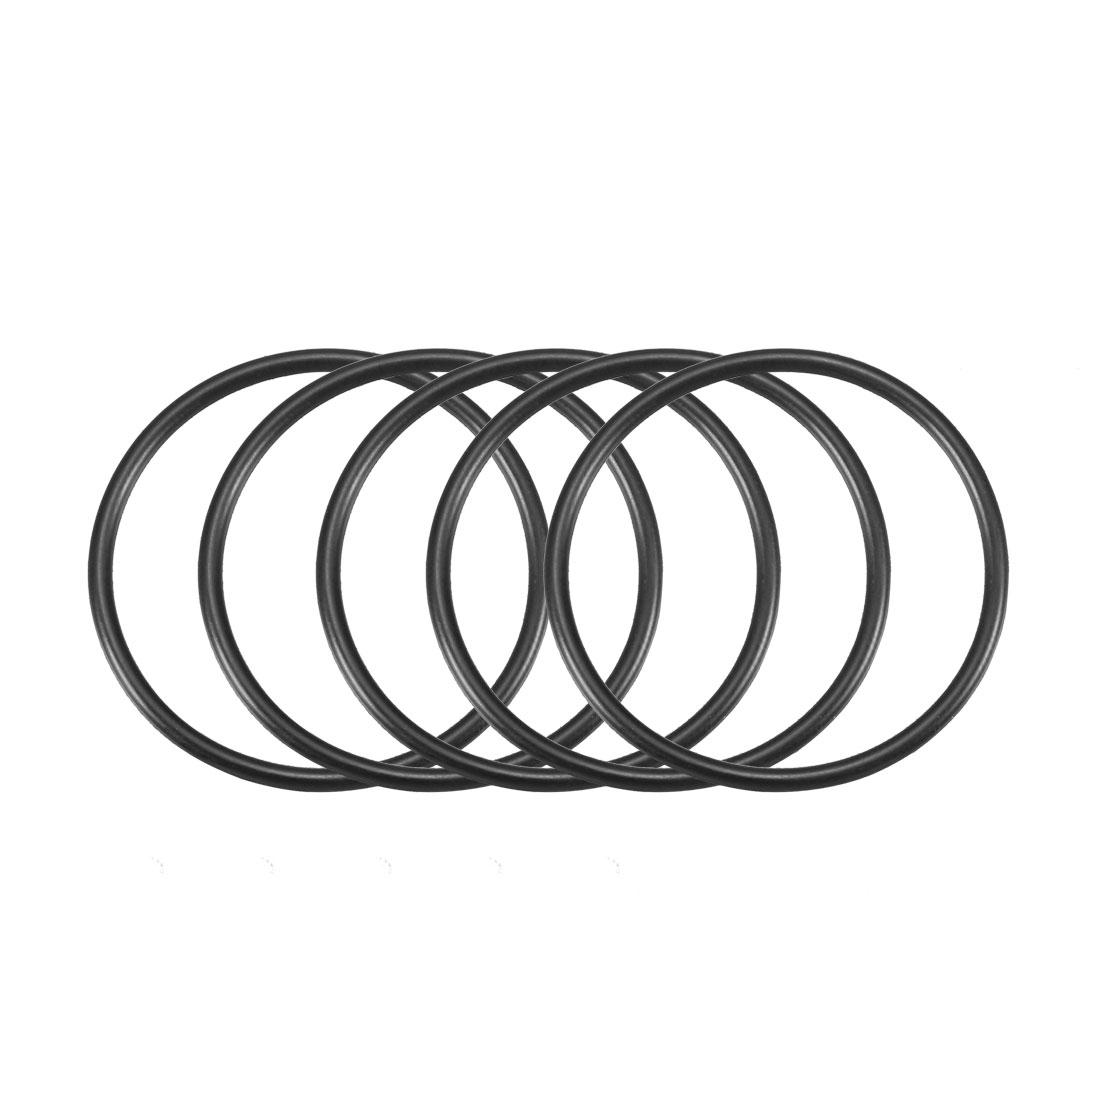 50Pcs Black 35 x 2mm Industrial Flexible Rubber O Ring Oil Sealing Grommets